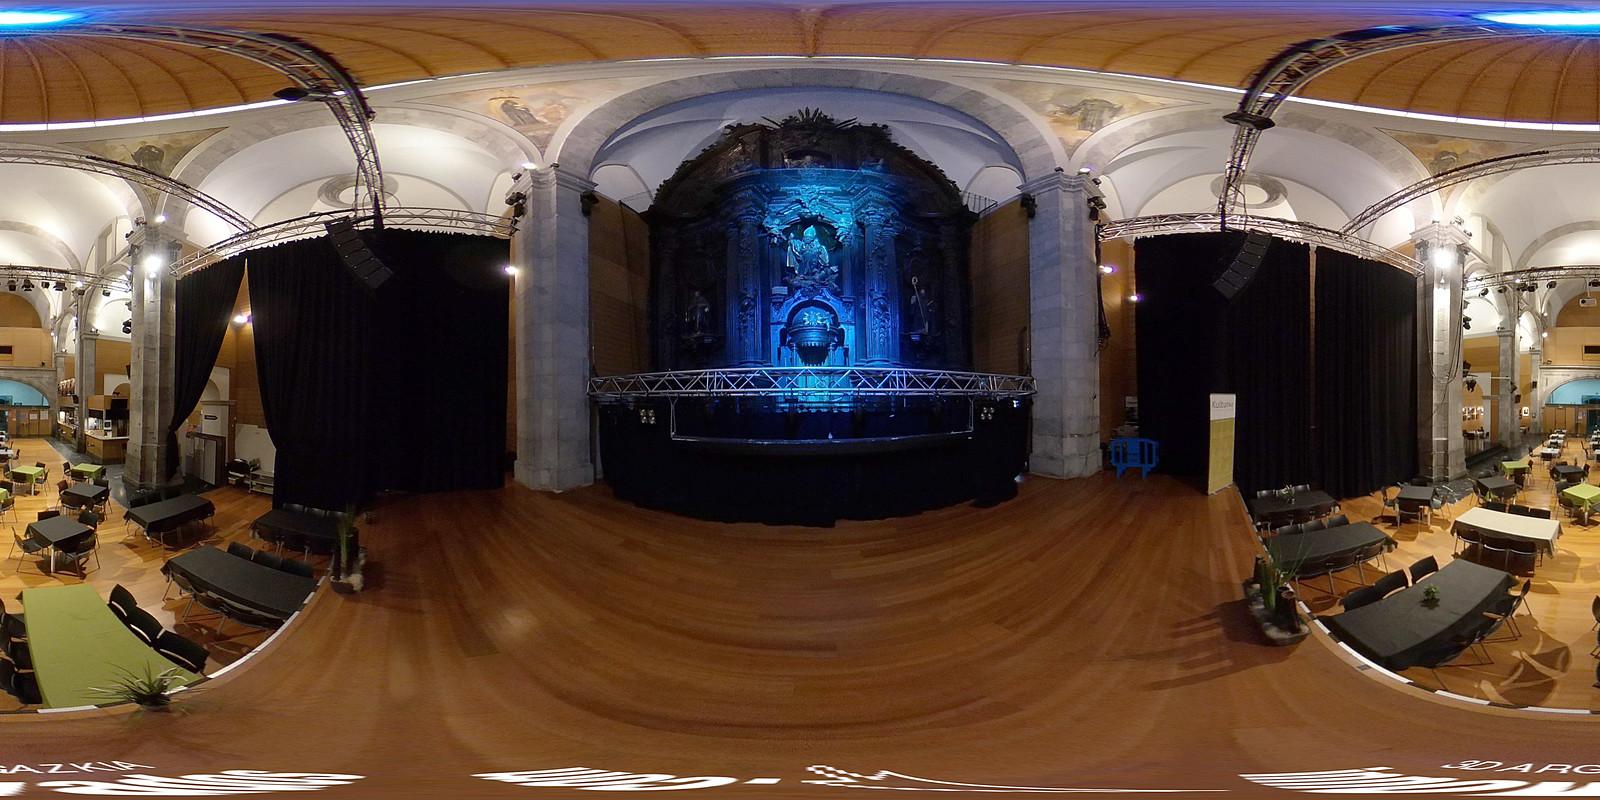 Sanagustin kulturgunea 360º